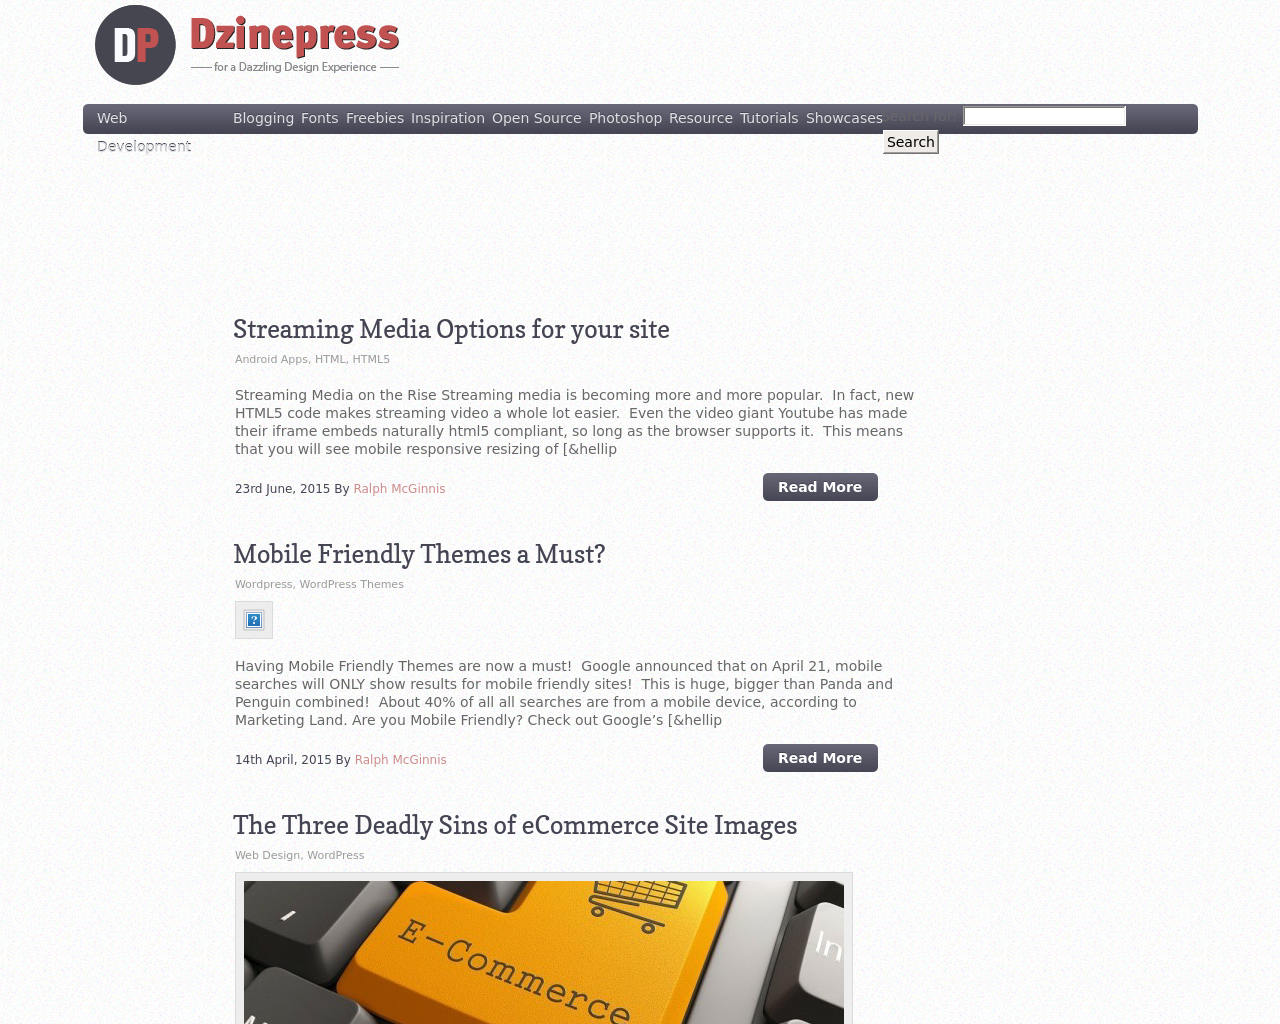 Dzinepress-Advertising-Reviews-Pricing